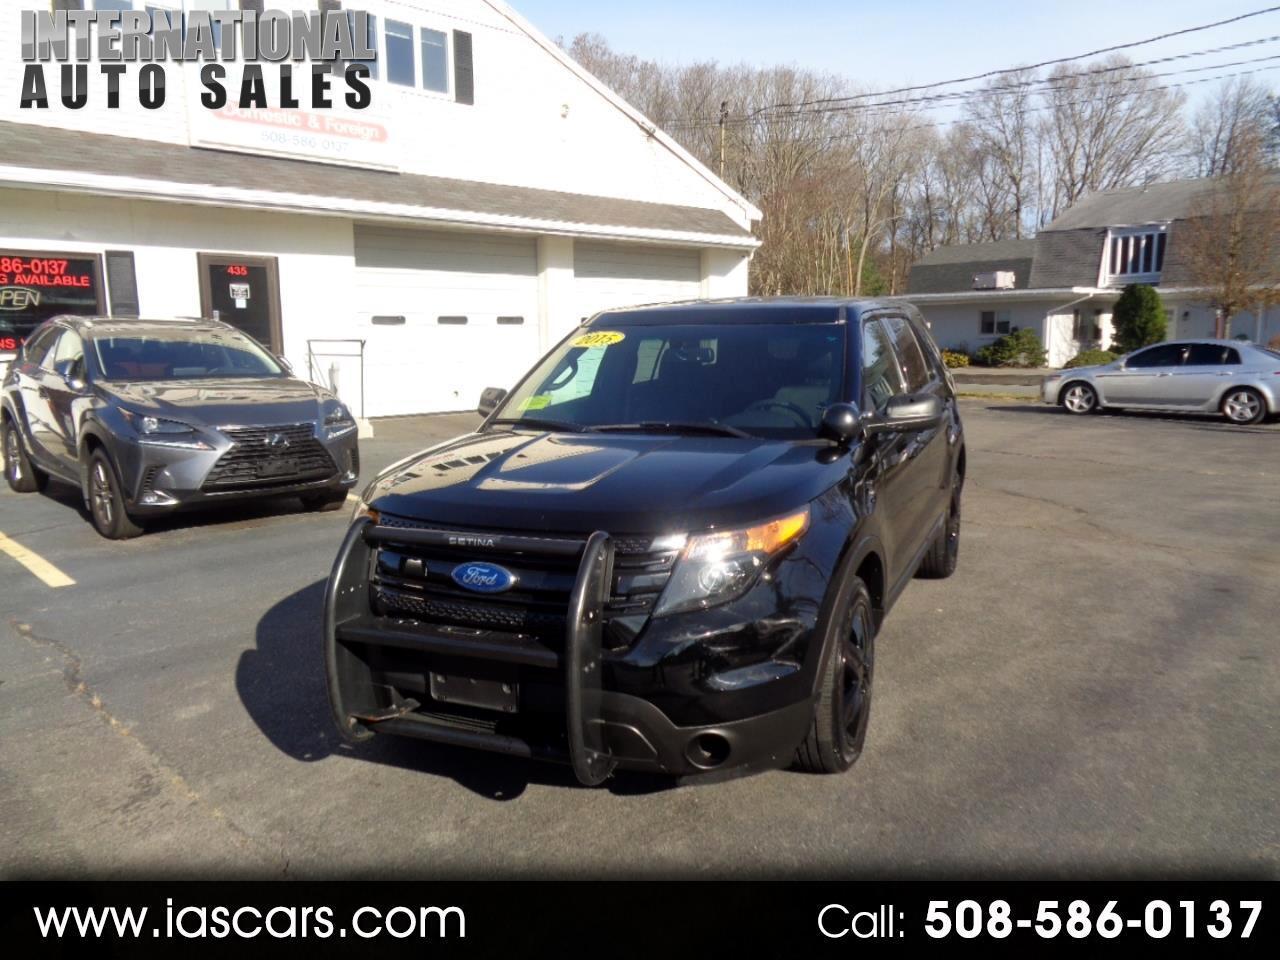 2015 Ford Explorer Police AWD